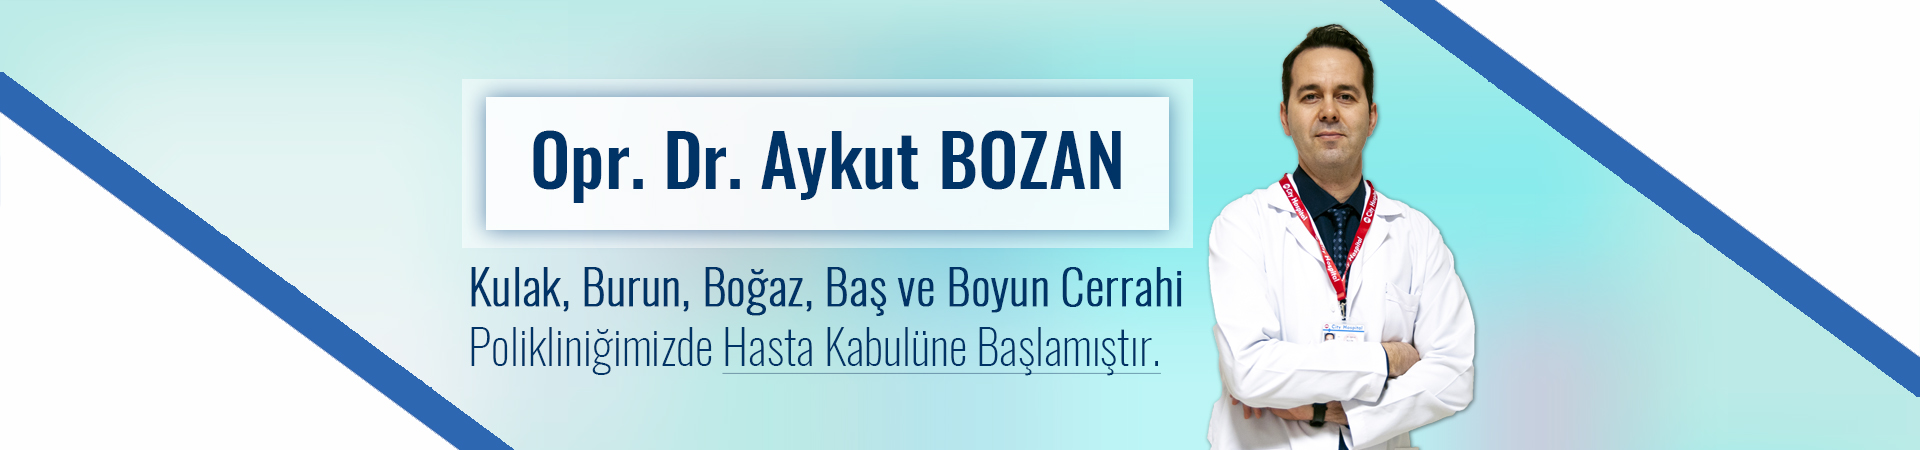 opr-dr-aykut-bozan-slider